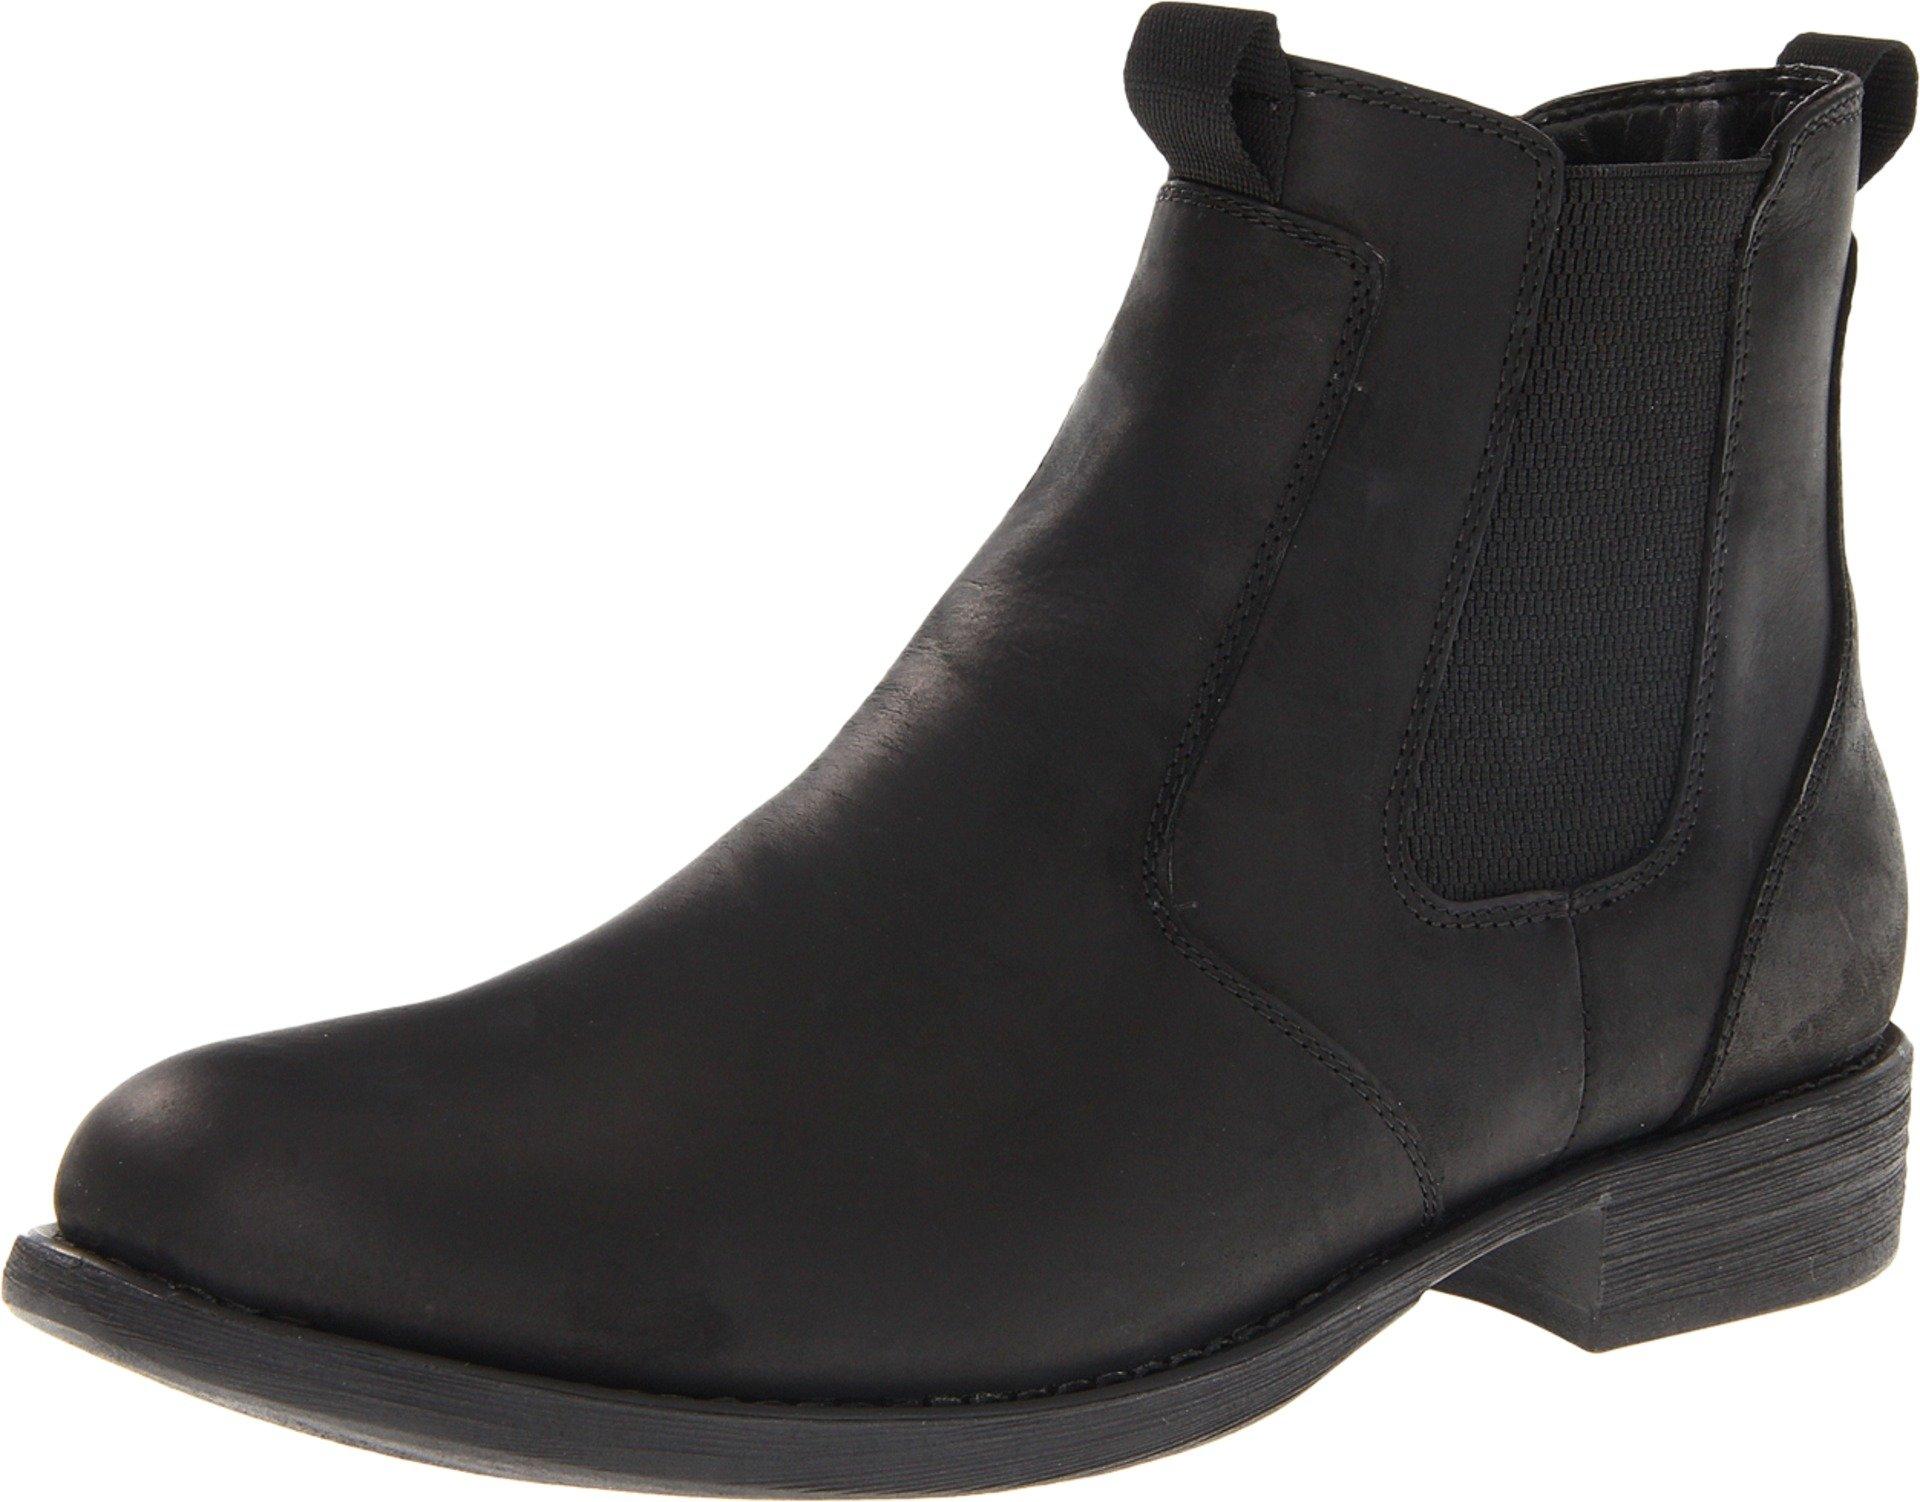 Eastland Men's Daily Double Chelsea Boot,Black,11 D US